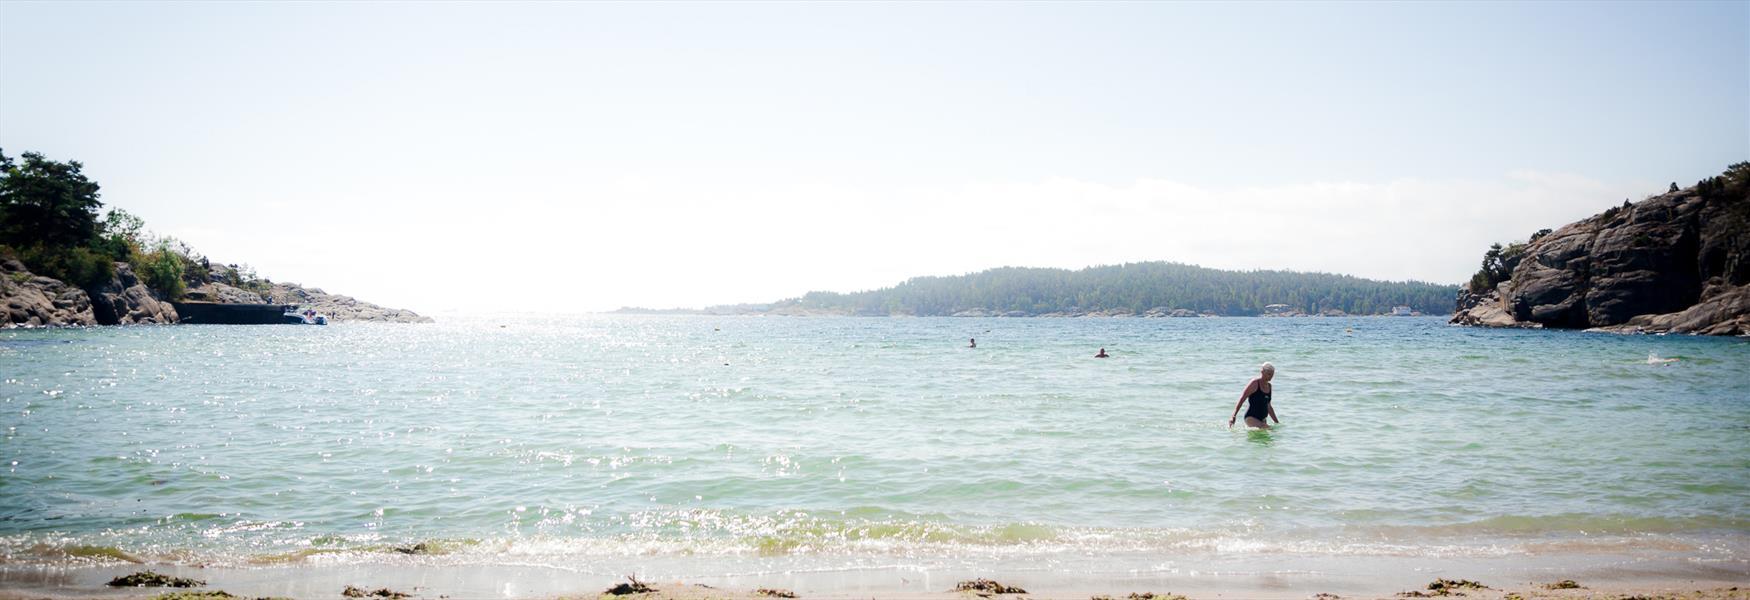 Vakre badesteder langs kysten